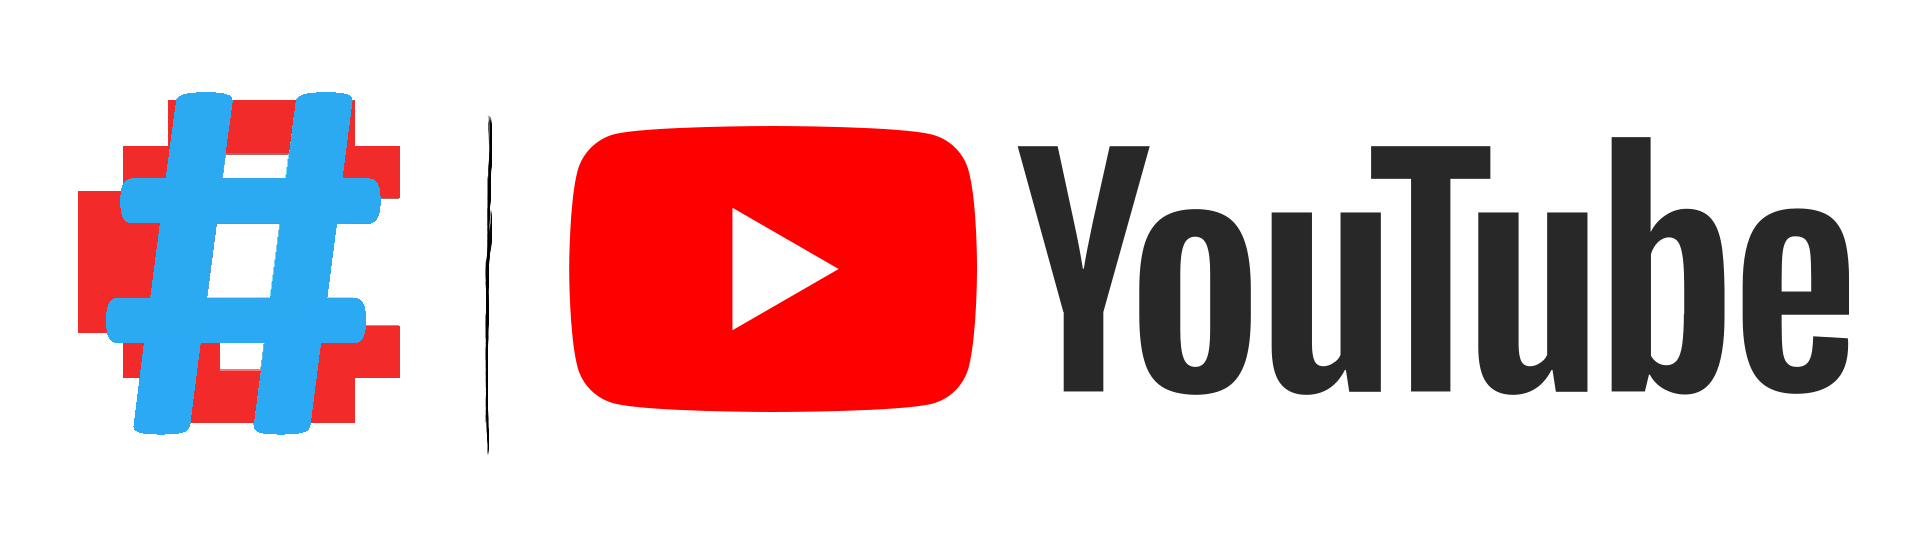 CXC Ultimate YouTube®™ Sim.